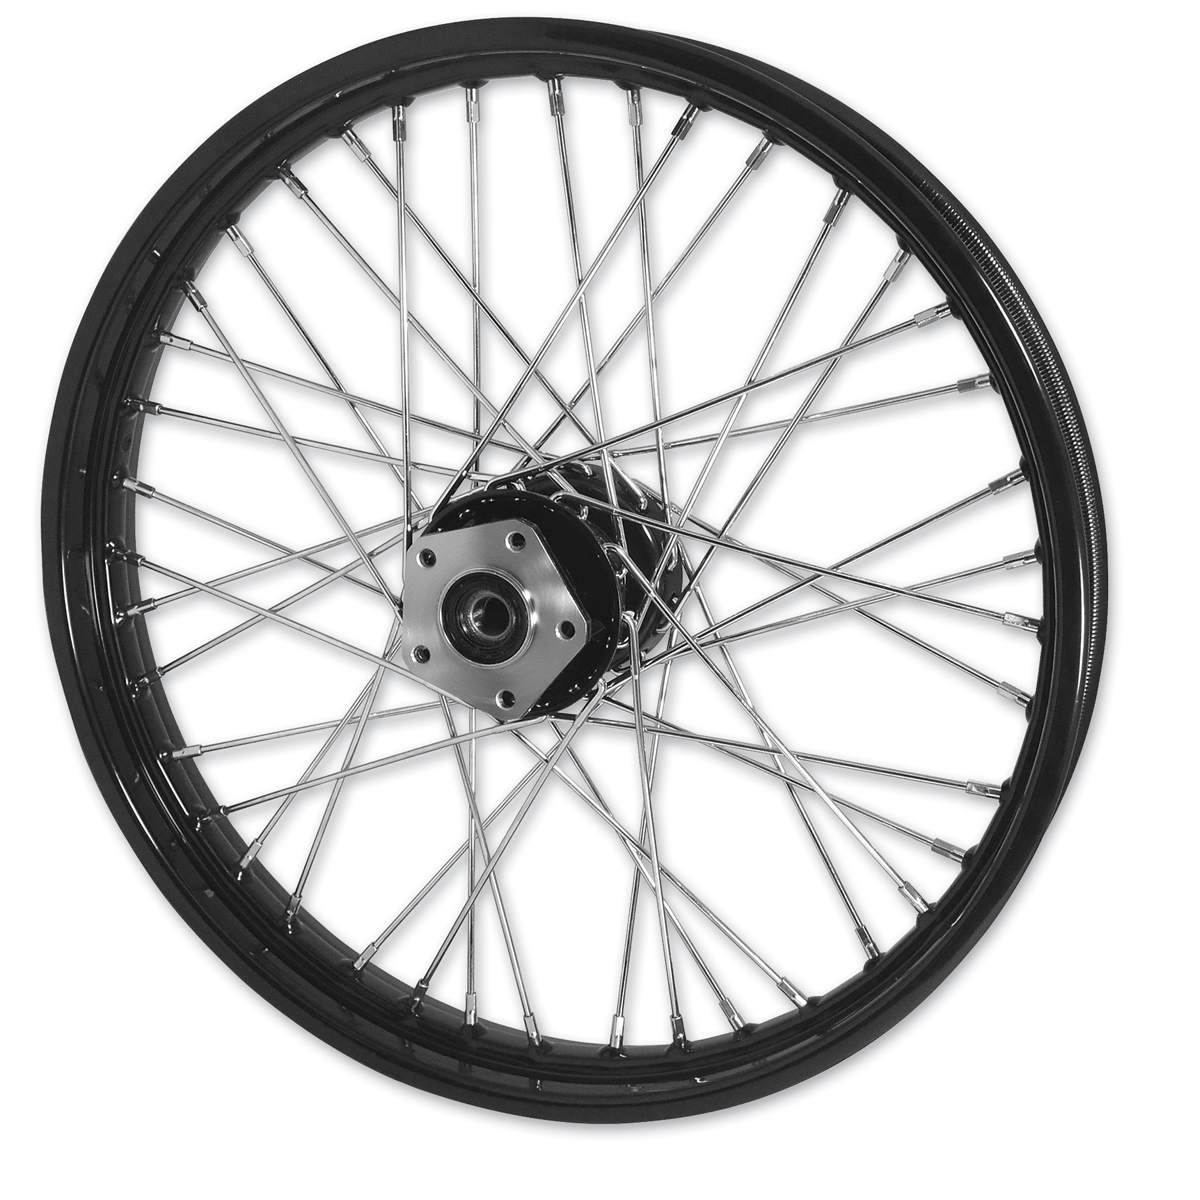 "Mid-USA Black 40 Spoke Front Wheel 21 X 2.15"""